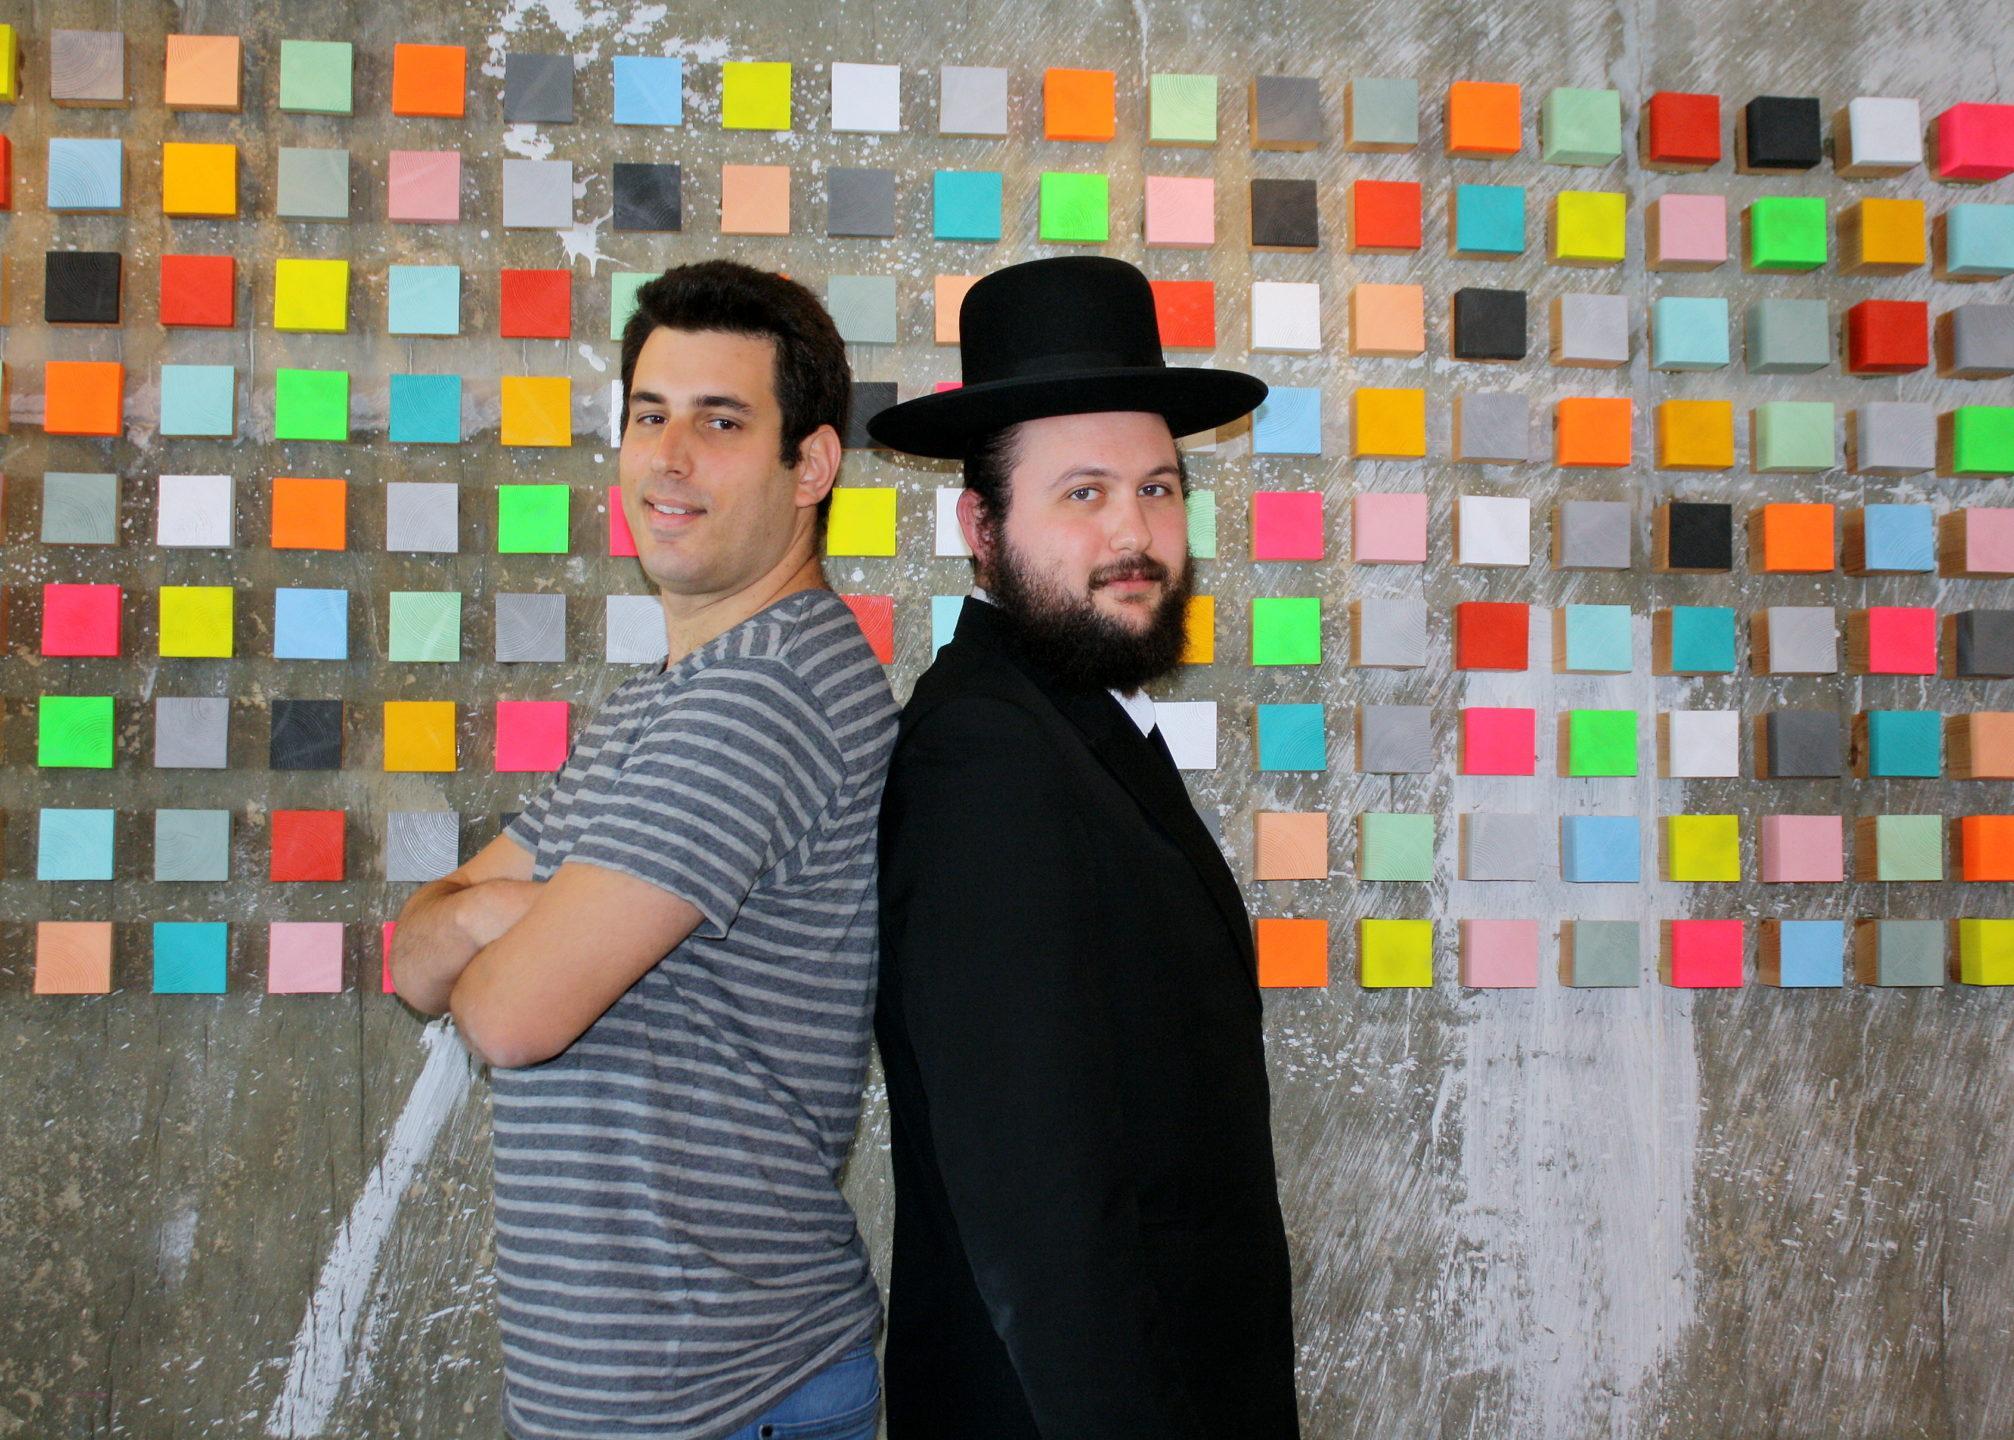 Idan Cohen & Ysrael Gurt, co-founders of Reflectiz